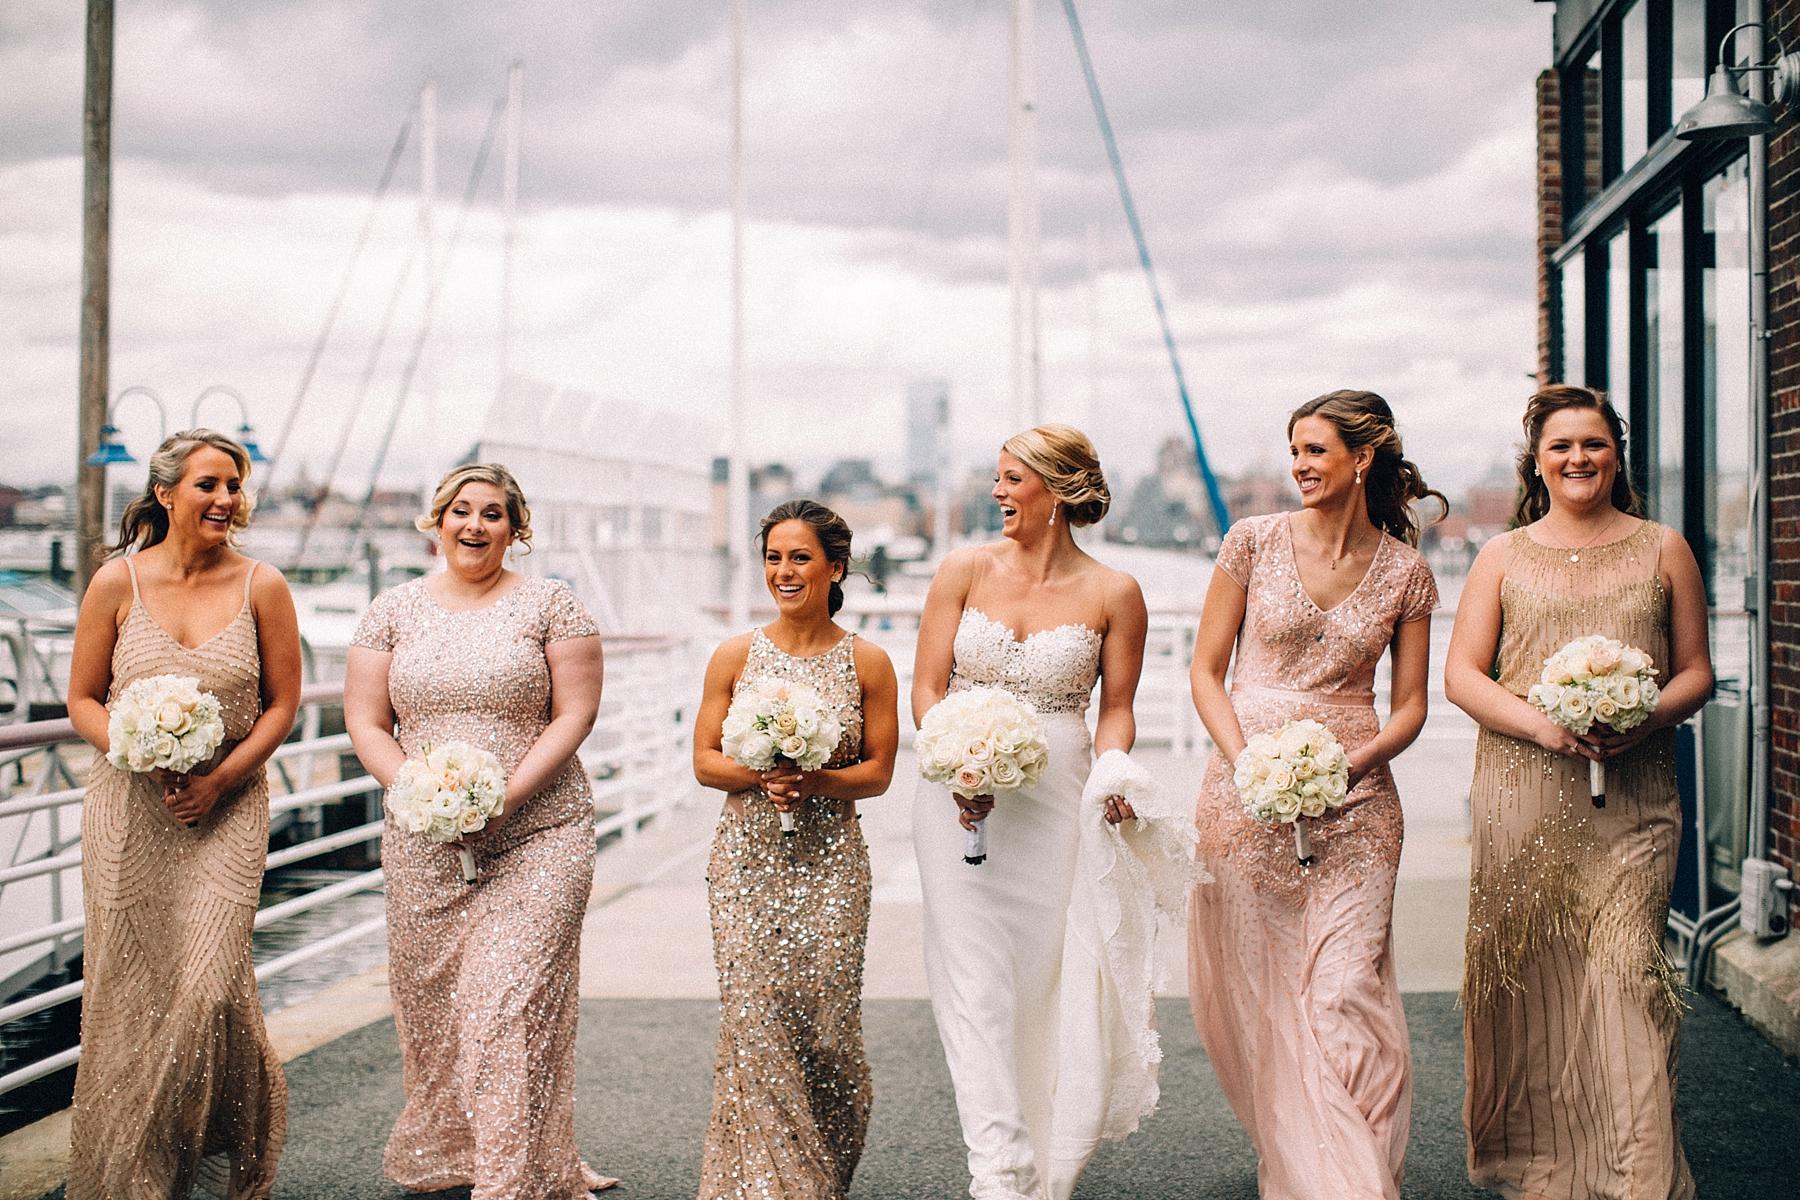 jersey-city-nj-wedding-photographer-top_0020.jpg